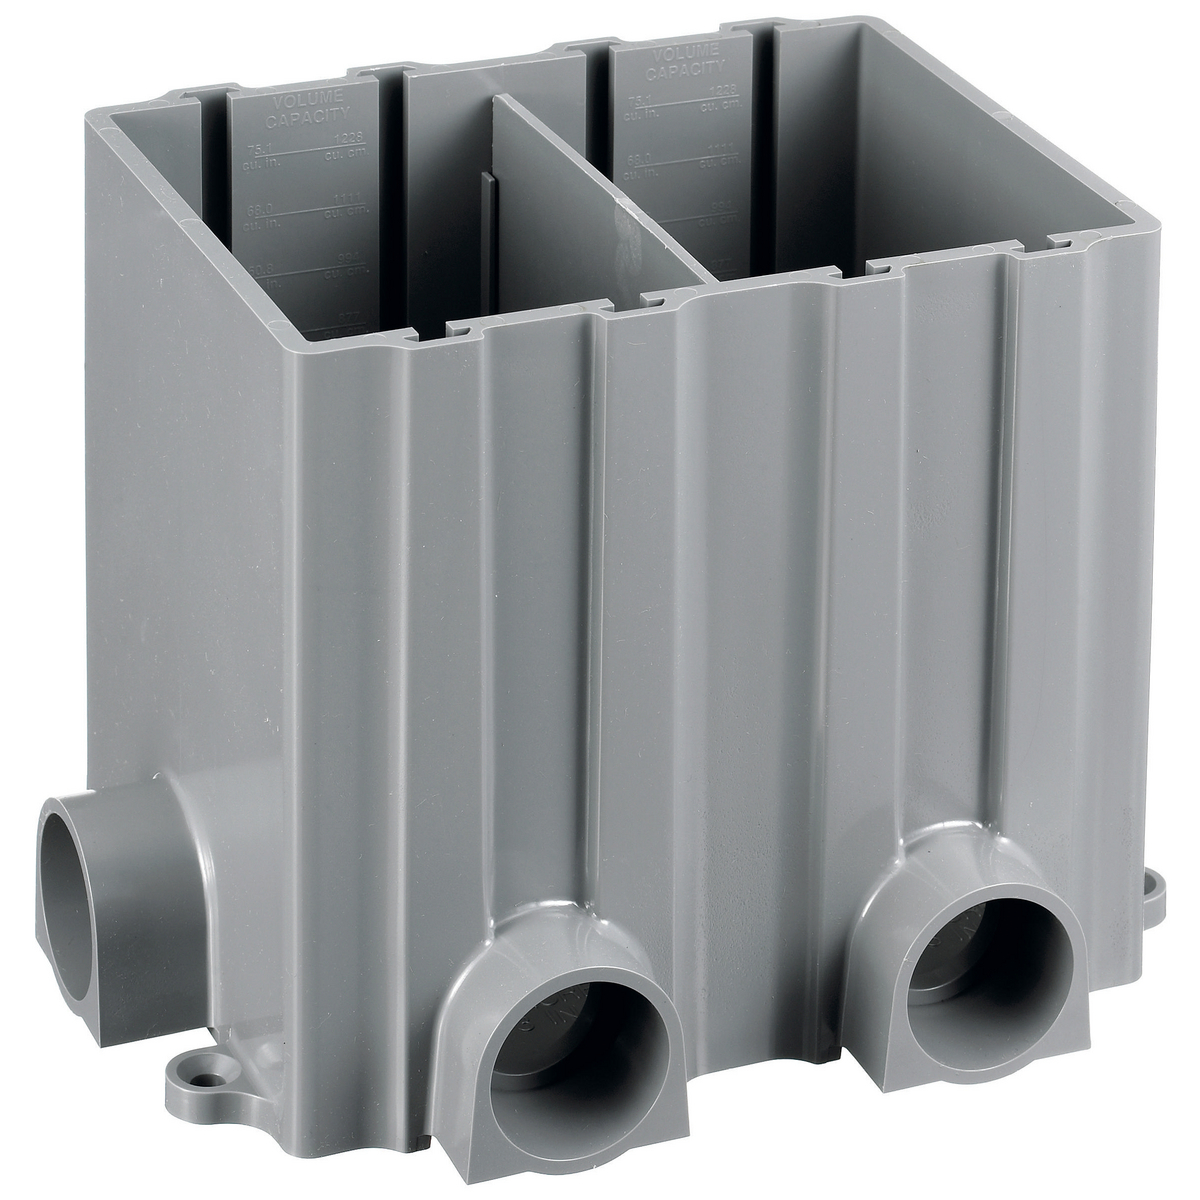 Hubbell PFBRG2 2Gang Non-Metallic Floor Box